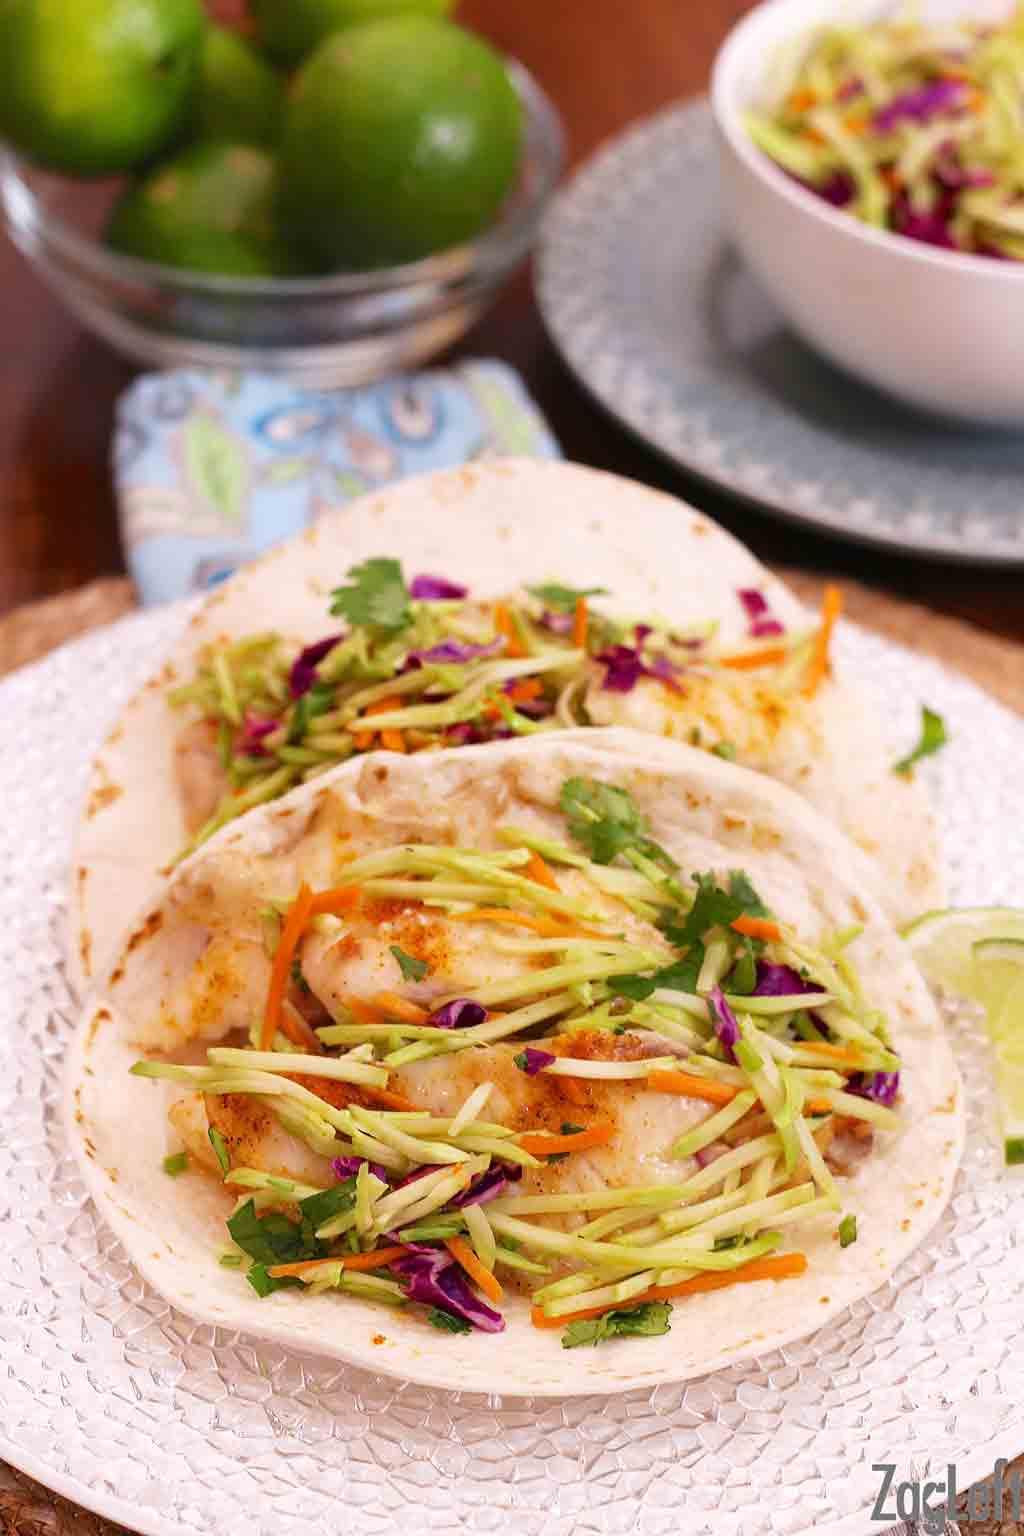 fish-tacos-zagleft-1w1.jpg